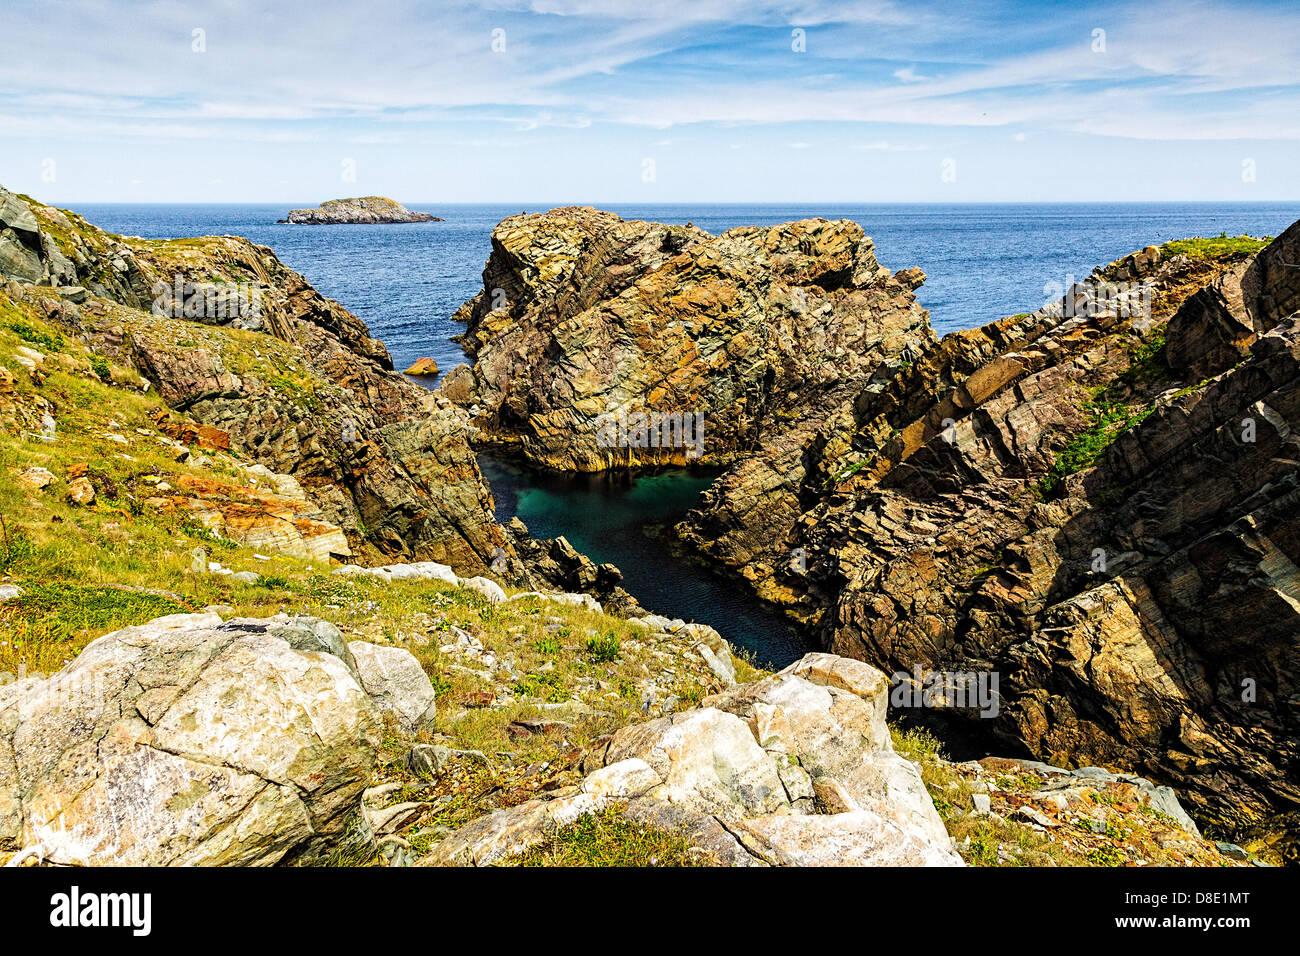 Rugged and Dramatic Landscape in Cape Bonavista, Newfoundland - Stock Image